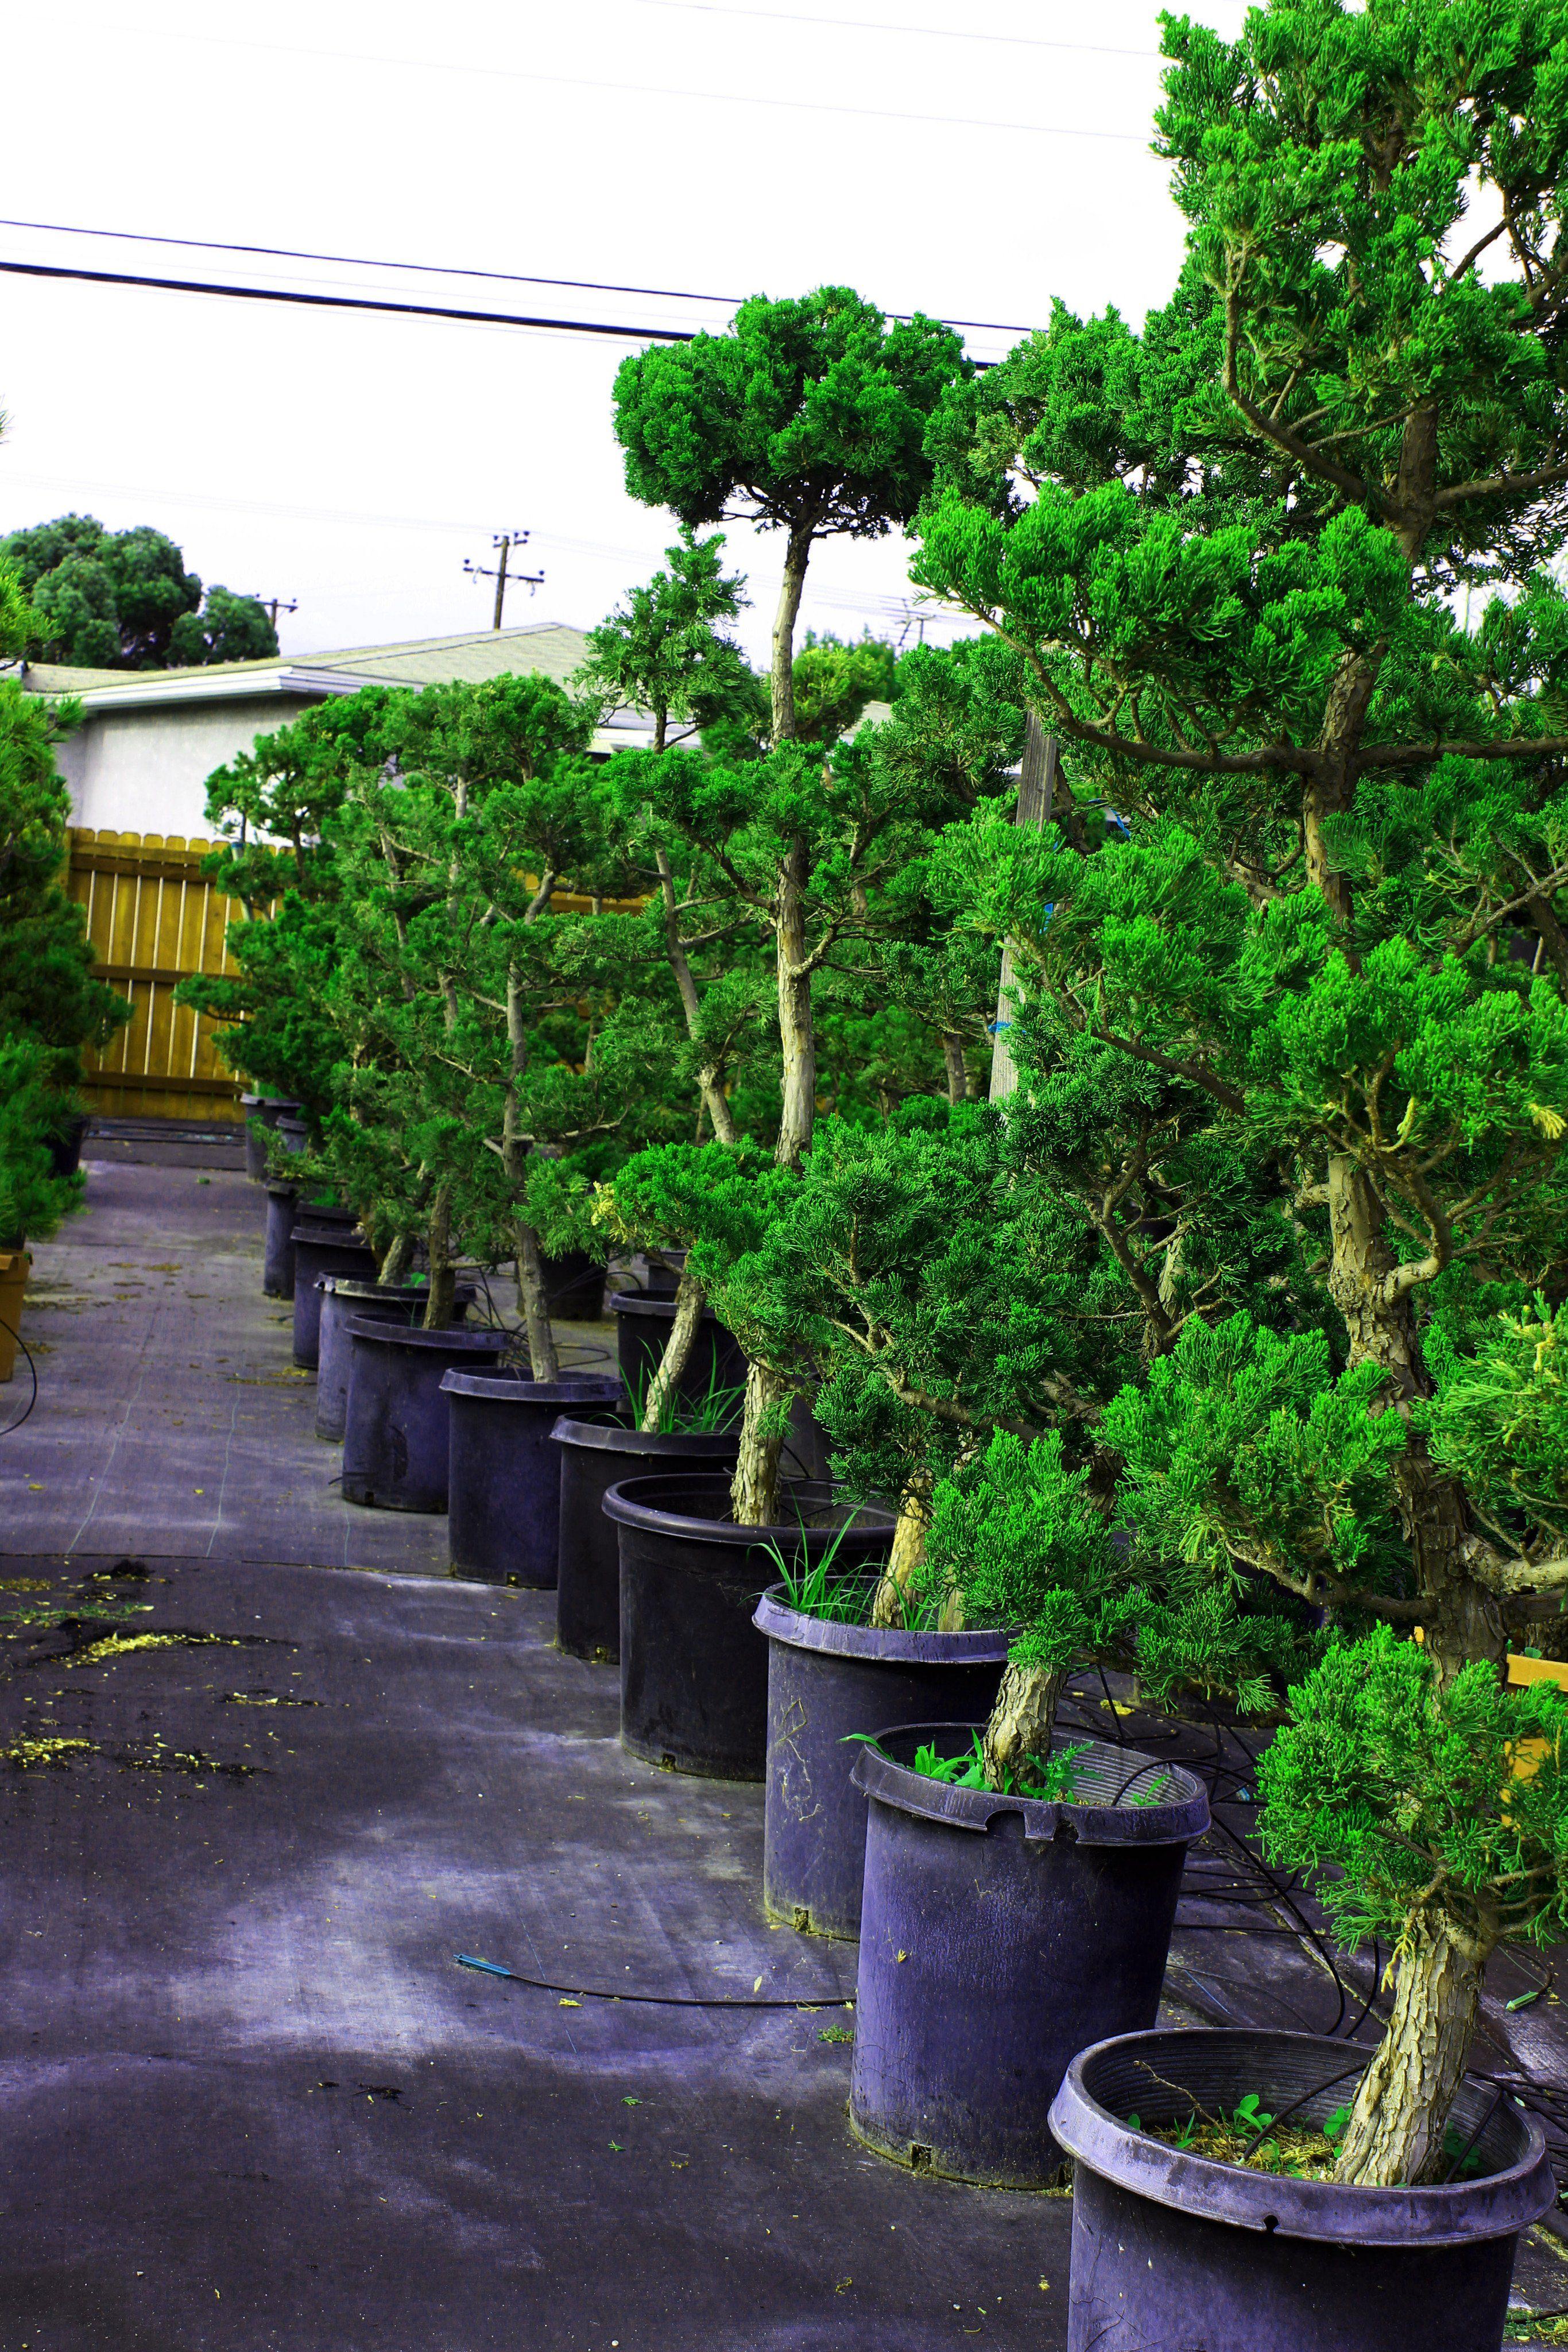 Hollywood Juniper Garden Bonsai Tree 15 Gallon Pot Garden Bonsai Tree Bonsai Garden Bonsai Tree